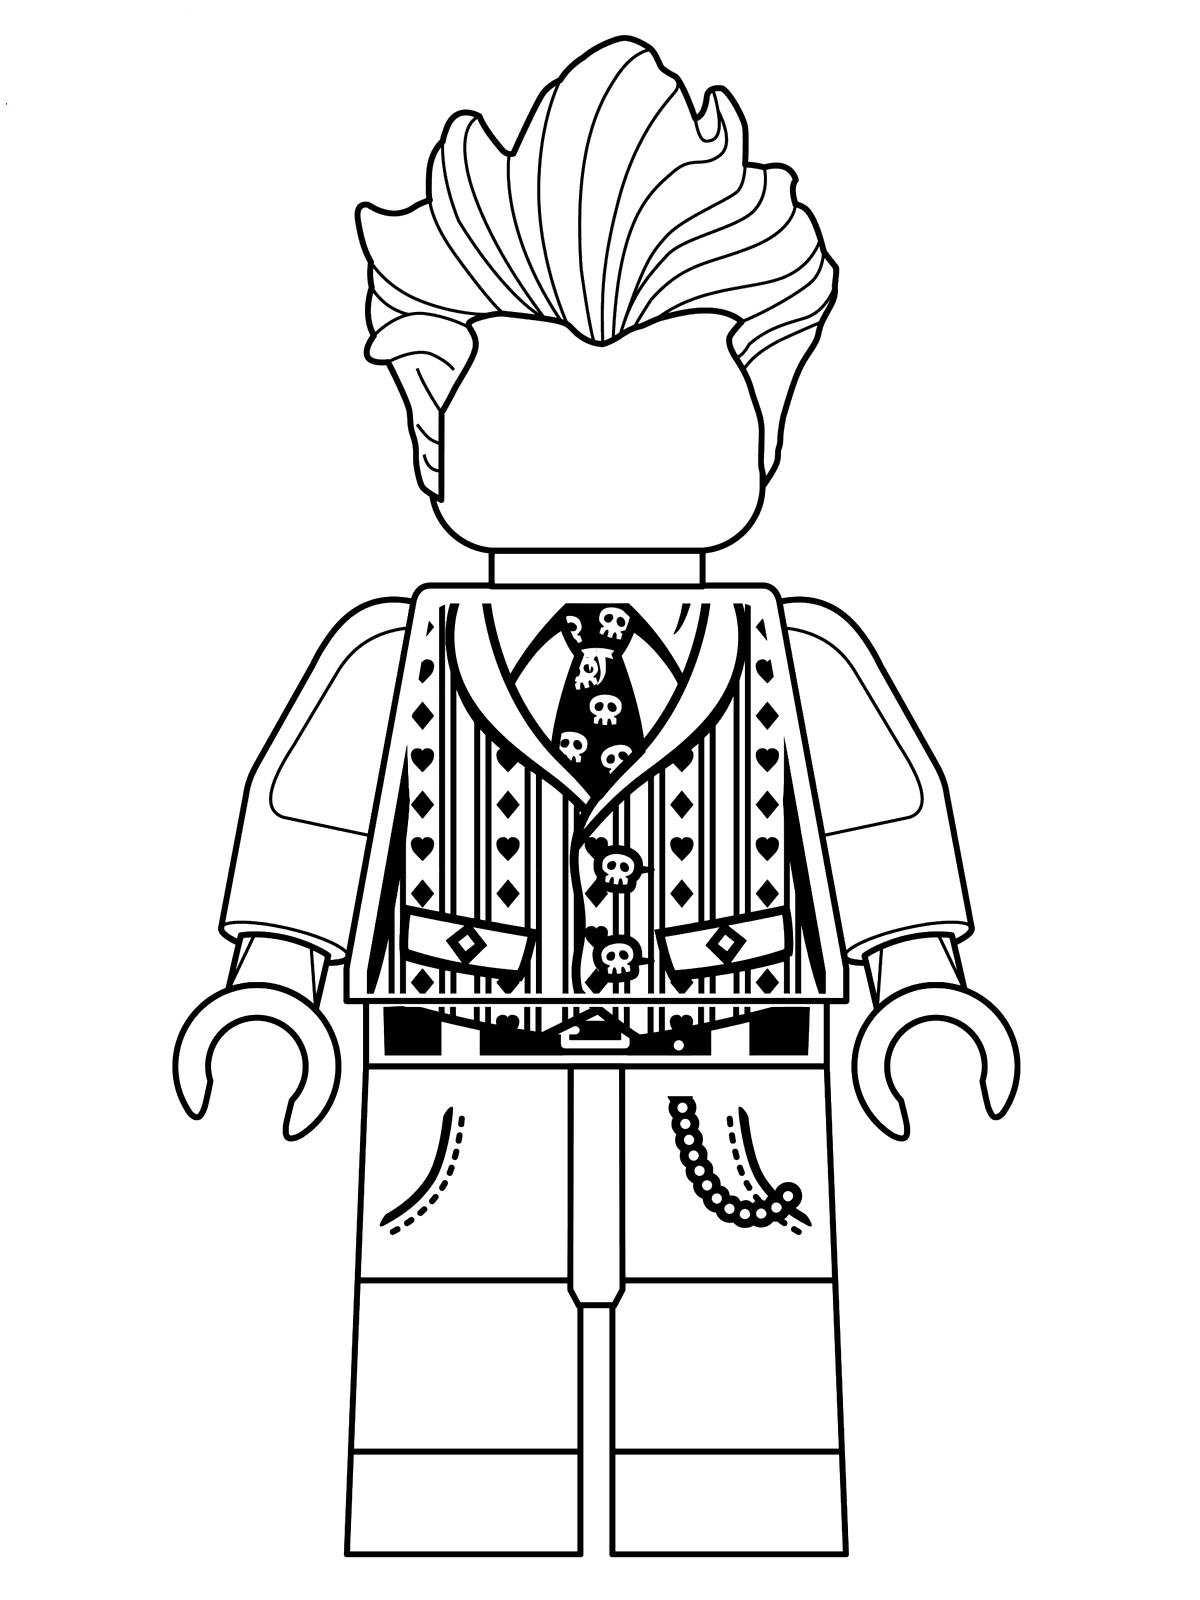 Malvorlage - Lego batman ausmalbilder hazdy